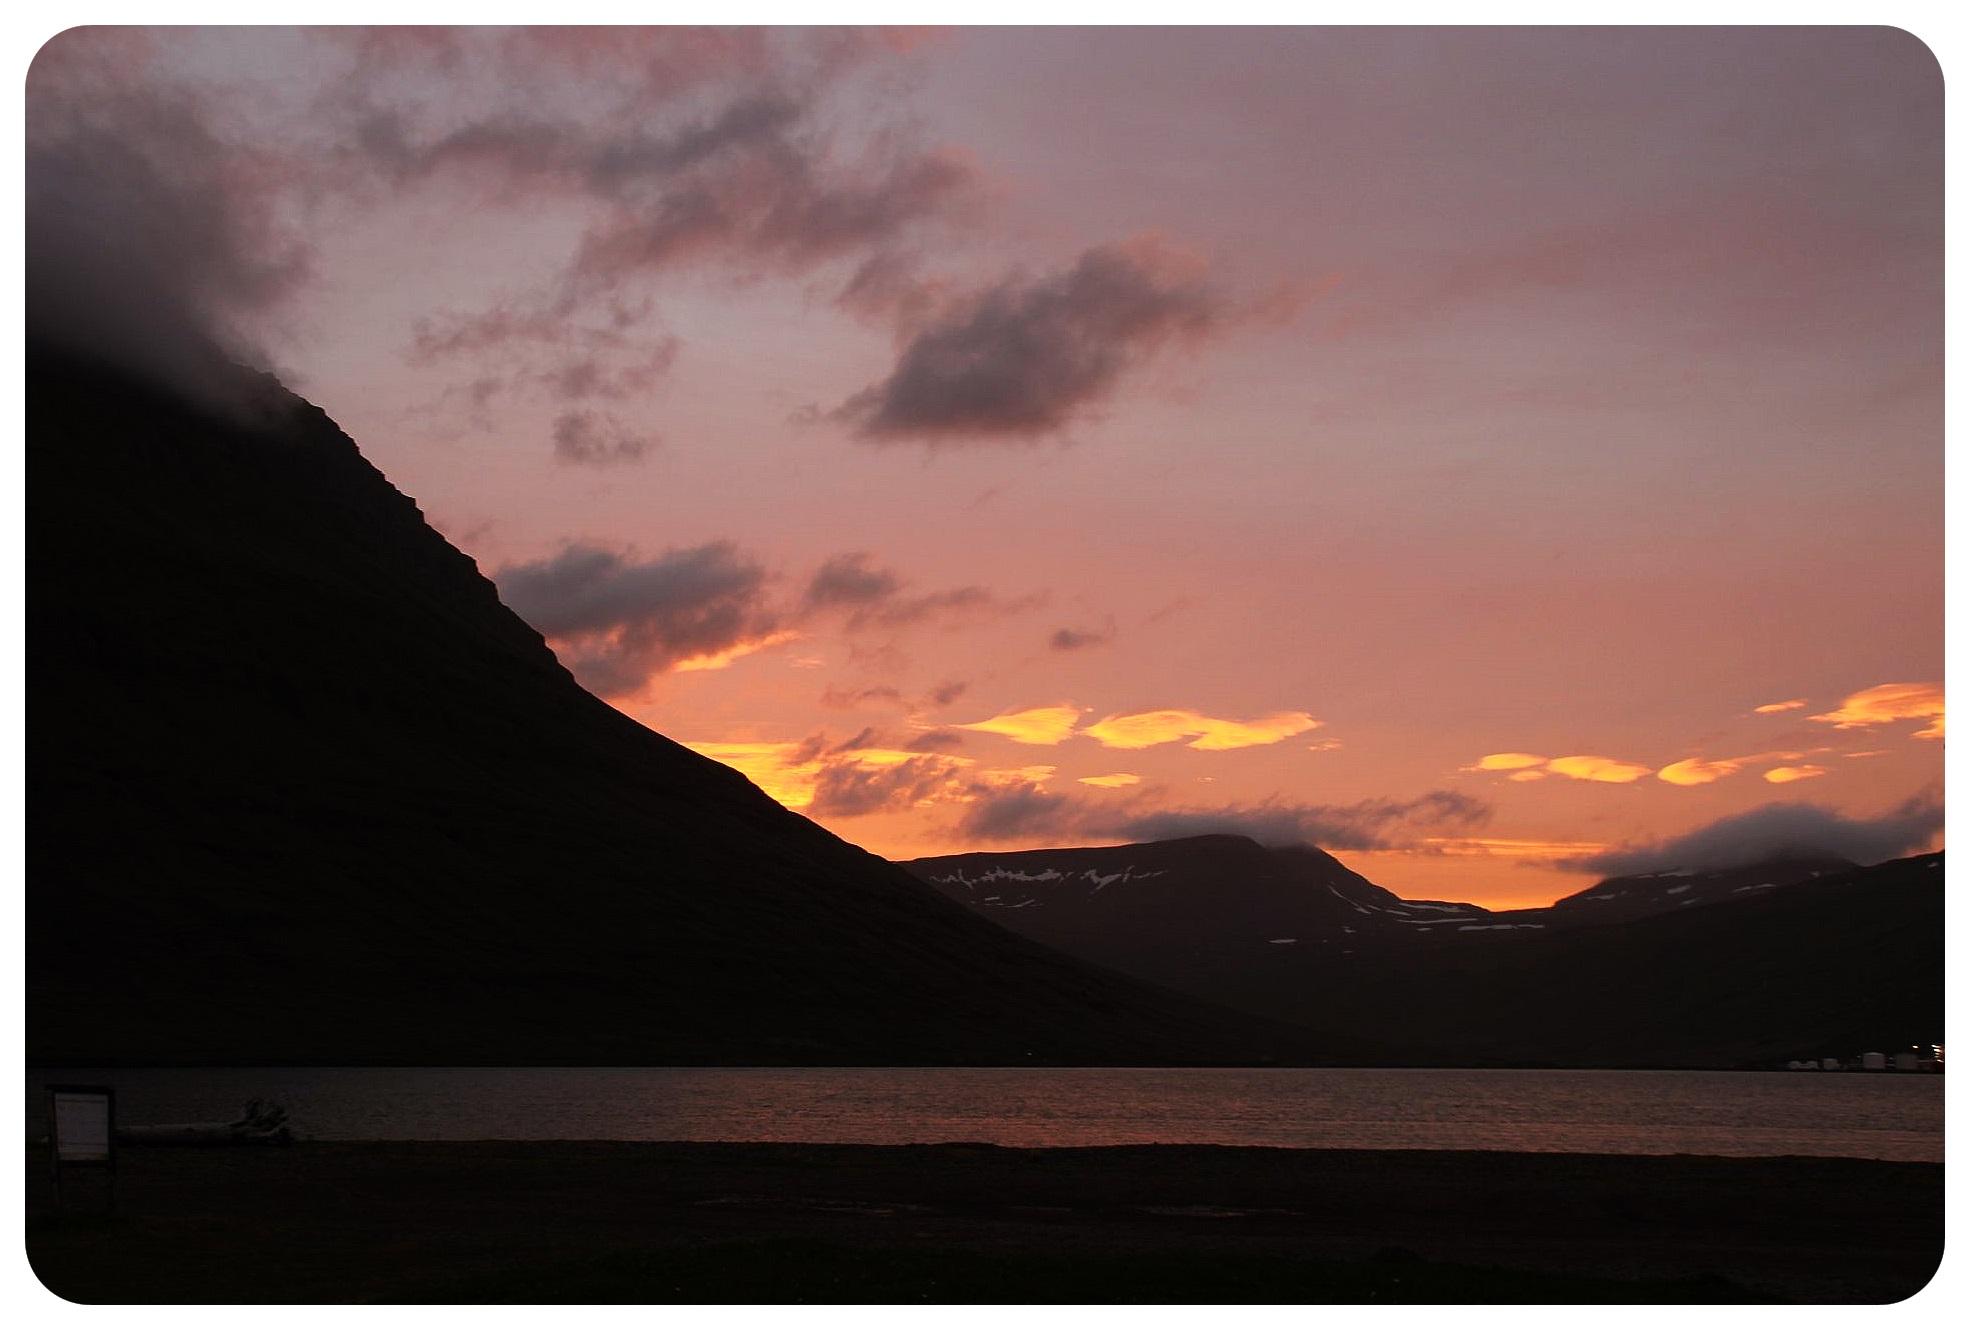 fjord sunset iceland